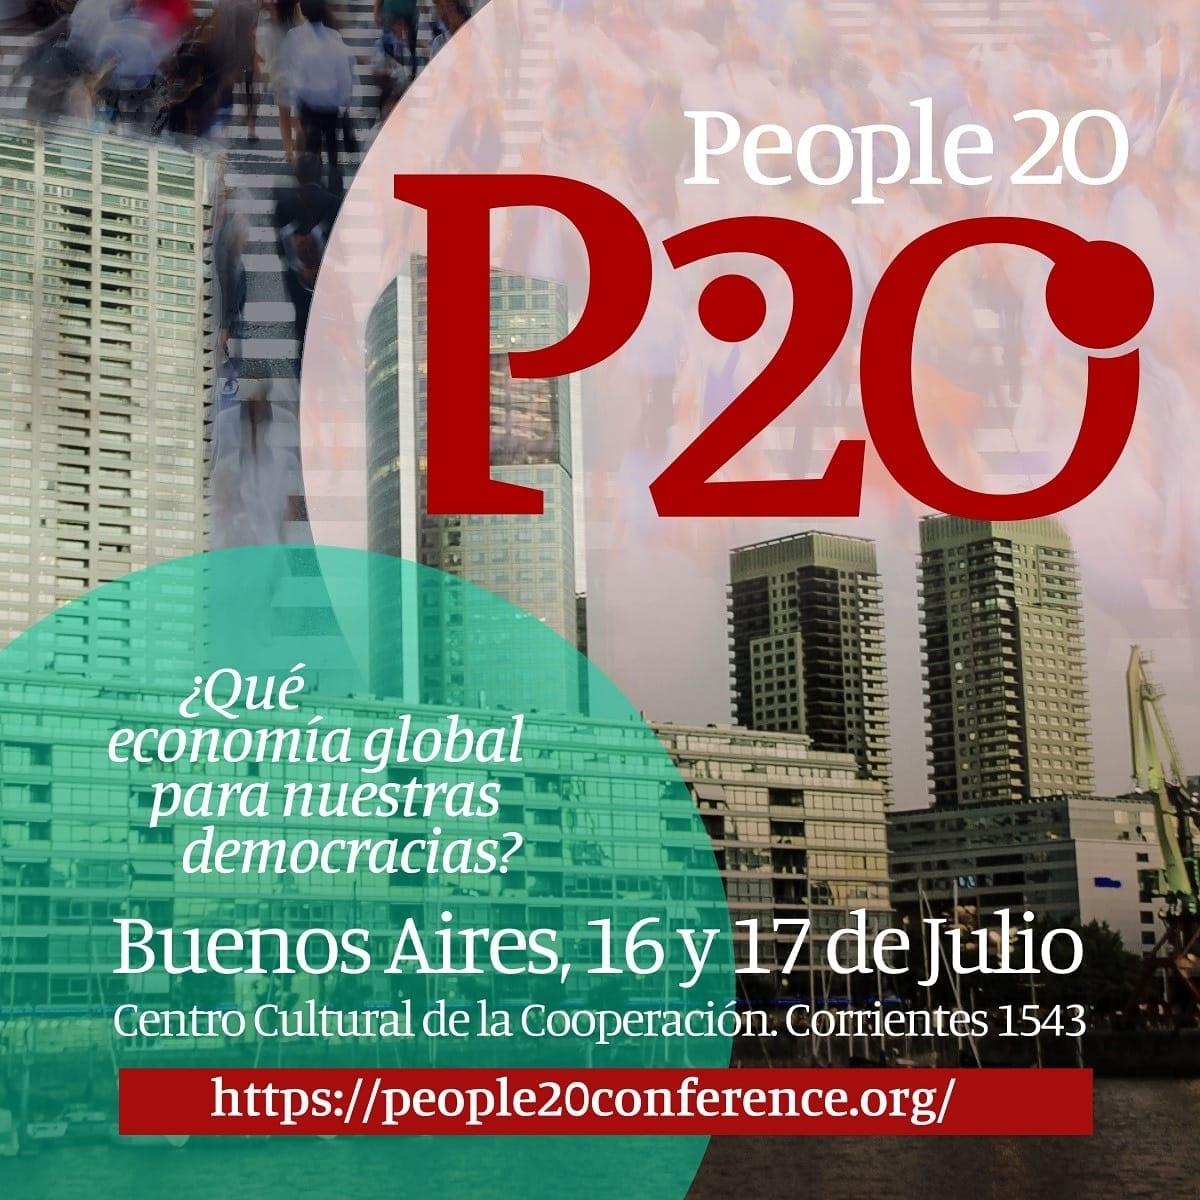 People 20